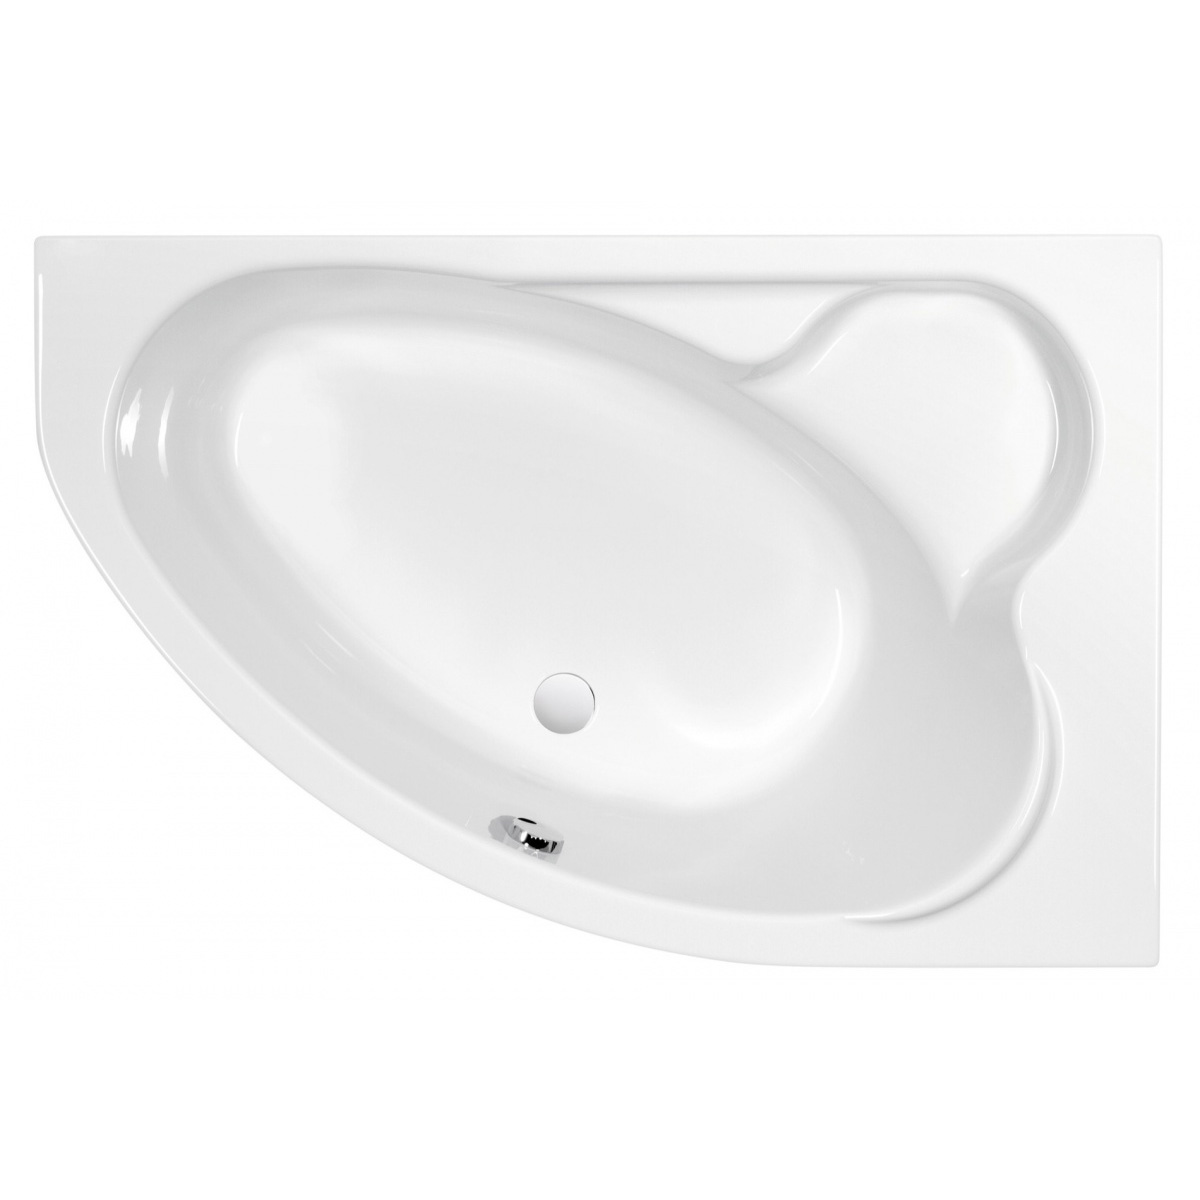 Акриловая ванна Cersanit Kaliope 153x100 правая фронтальная панель cersanit kaliope 170 правая p pa kaliope 170 r